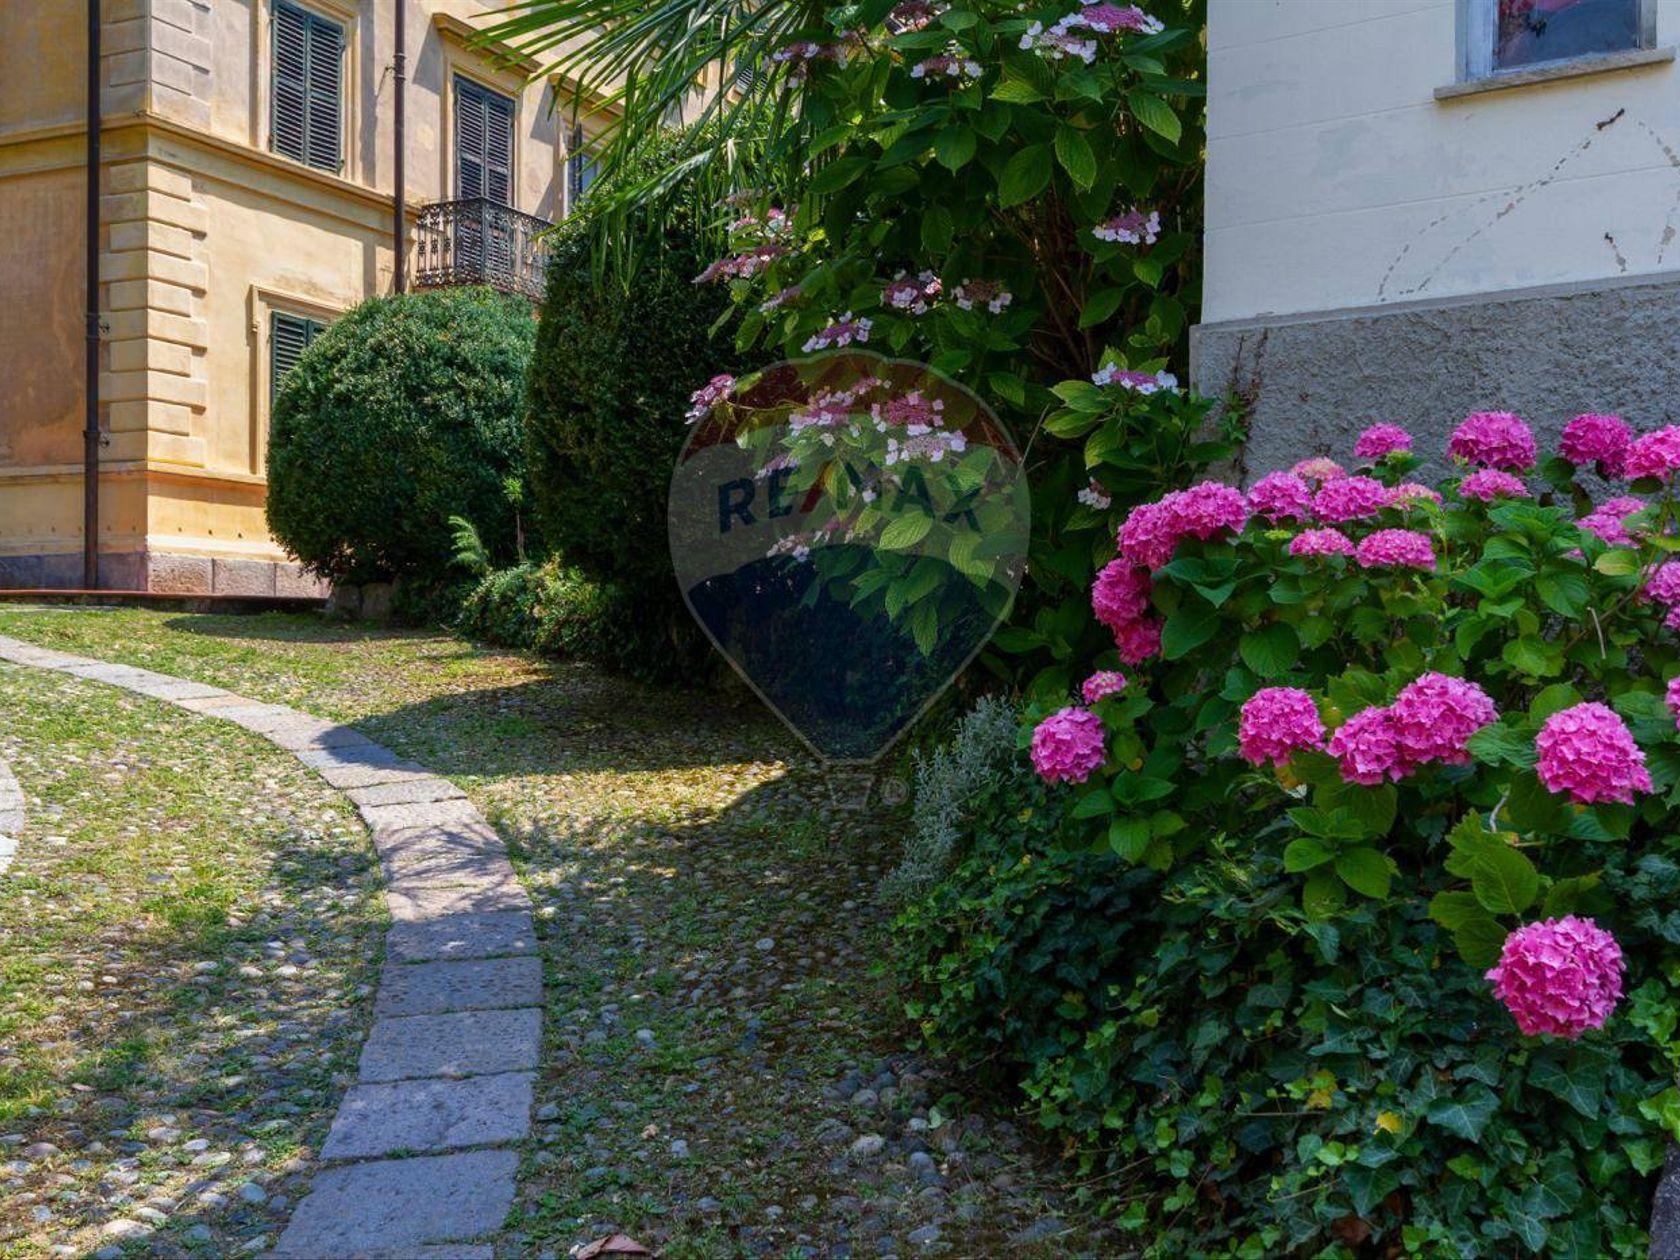 Casa Indipendente Torino-precollina Collina, Torino, TO Vendita - Foto 20